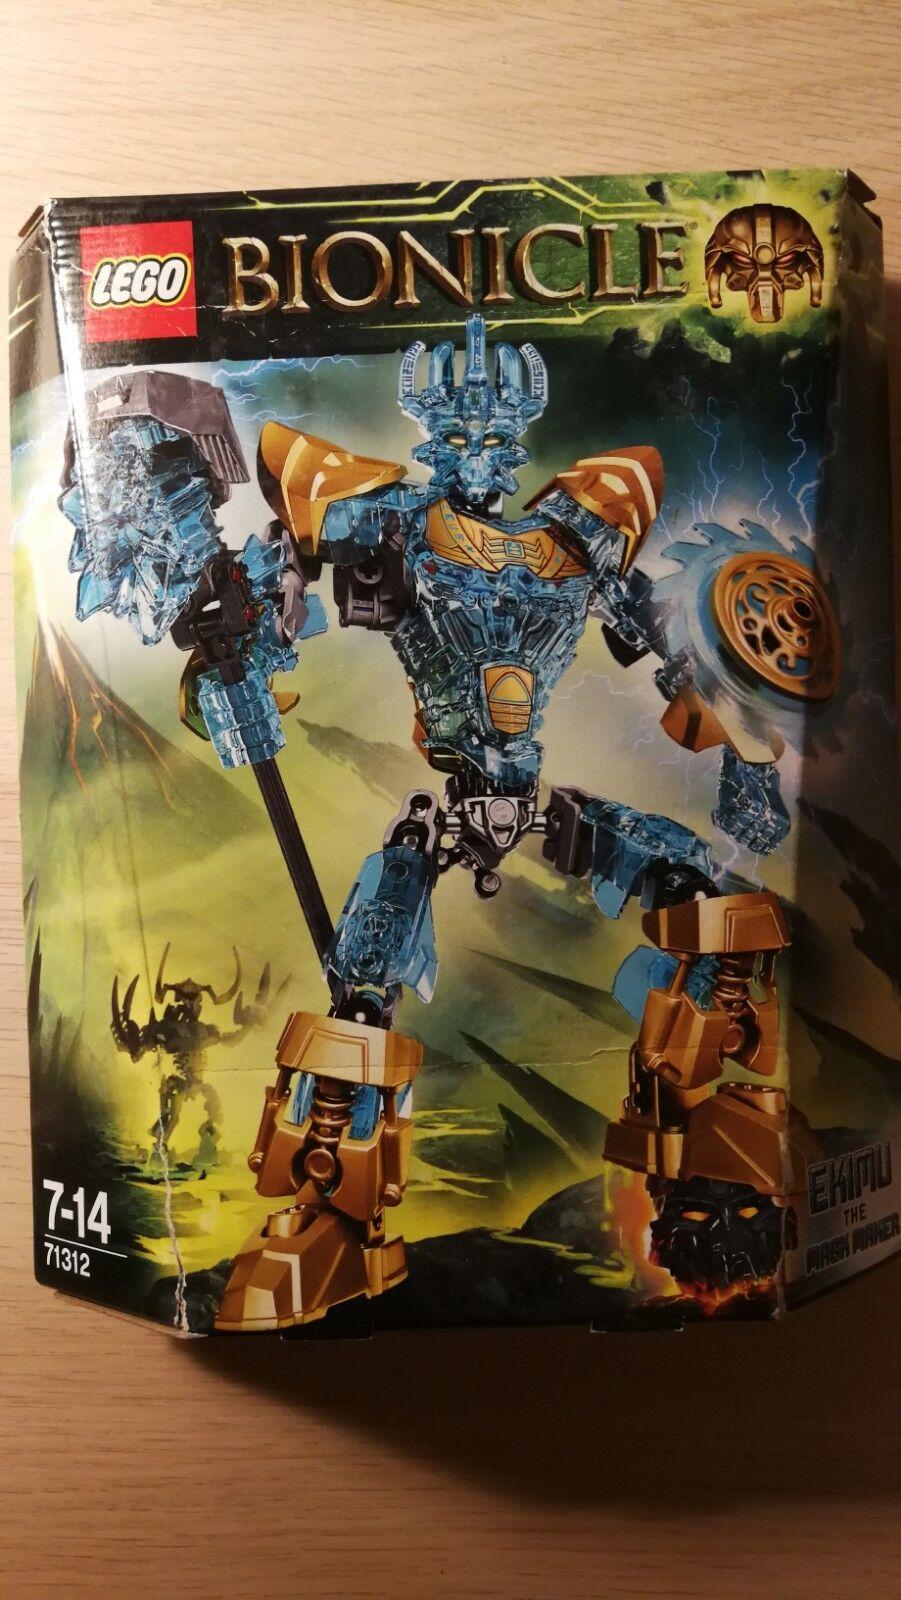 NEW LEGO Bionicle Ekimu the Mask Maker 71312 ReStiefel Hunter Beast Creature